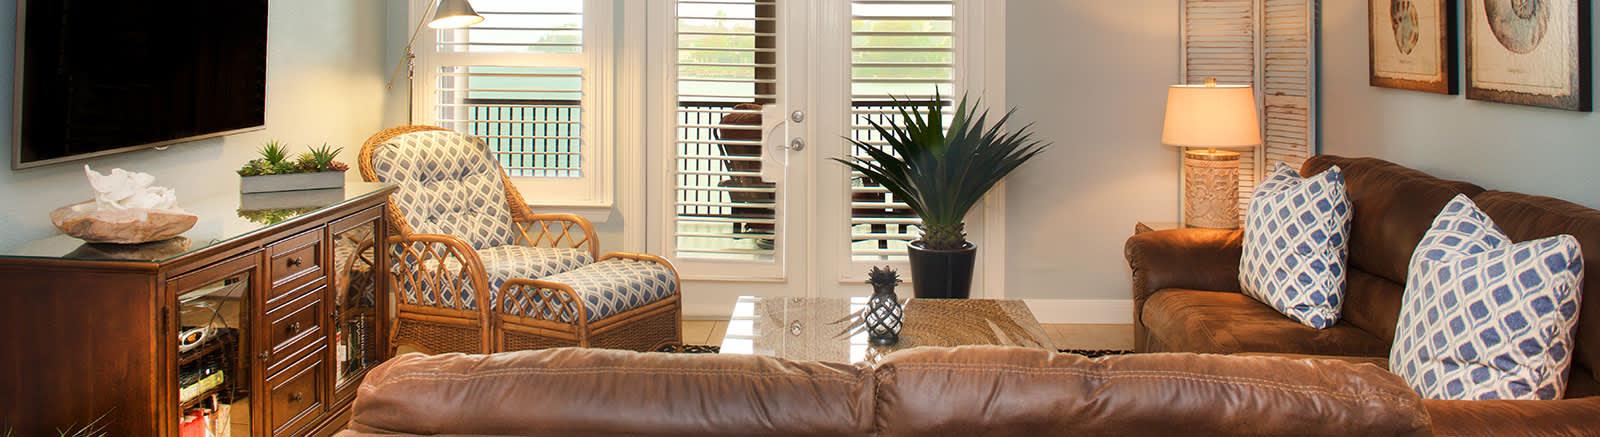 Private Home Rentals of Horseshoe Bay Resort